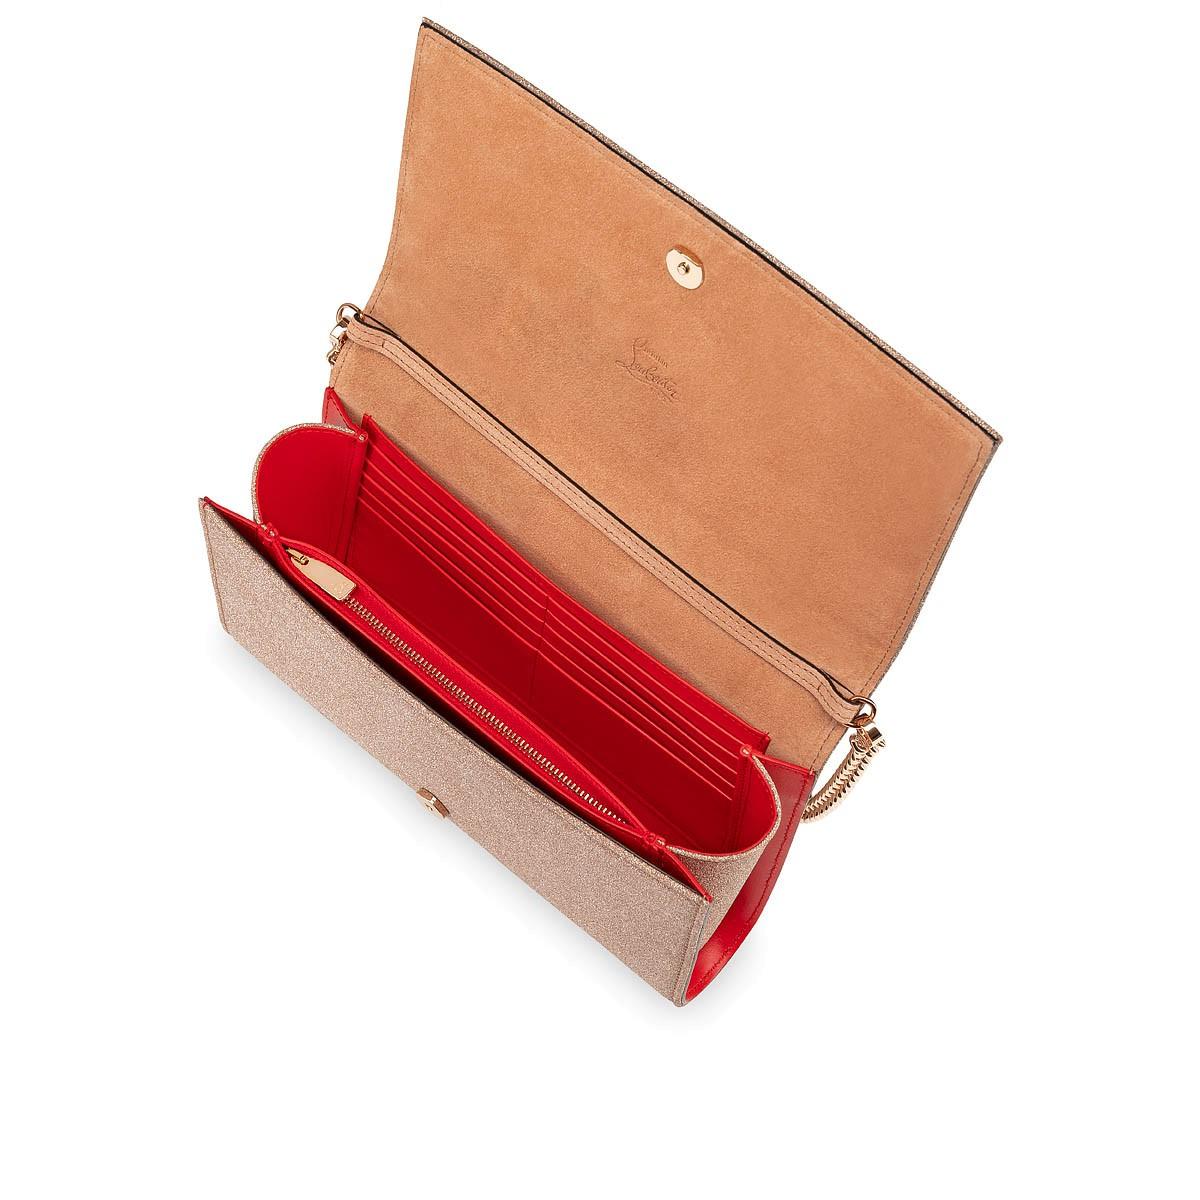 Bags - Pochette Paloma - Christian Louboutin